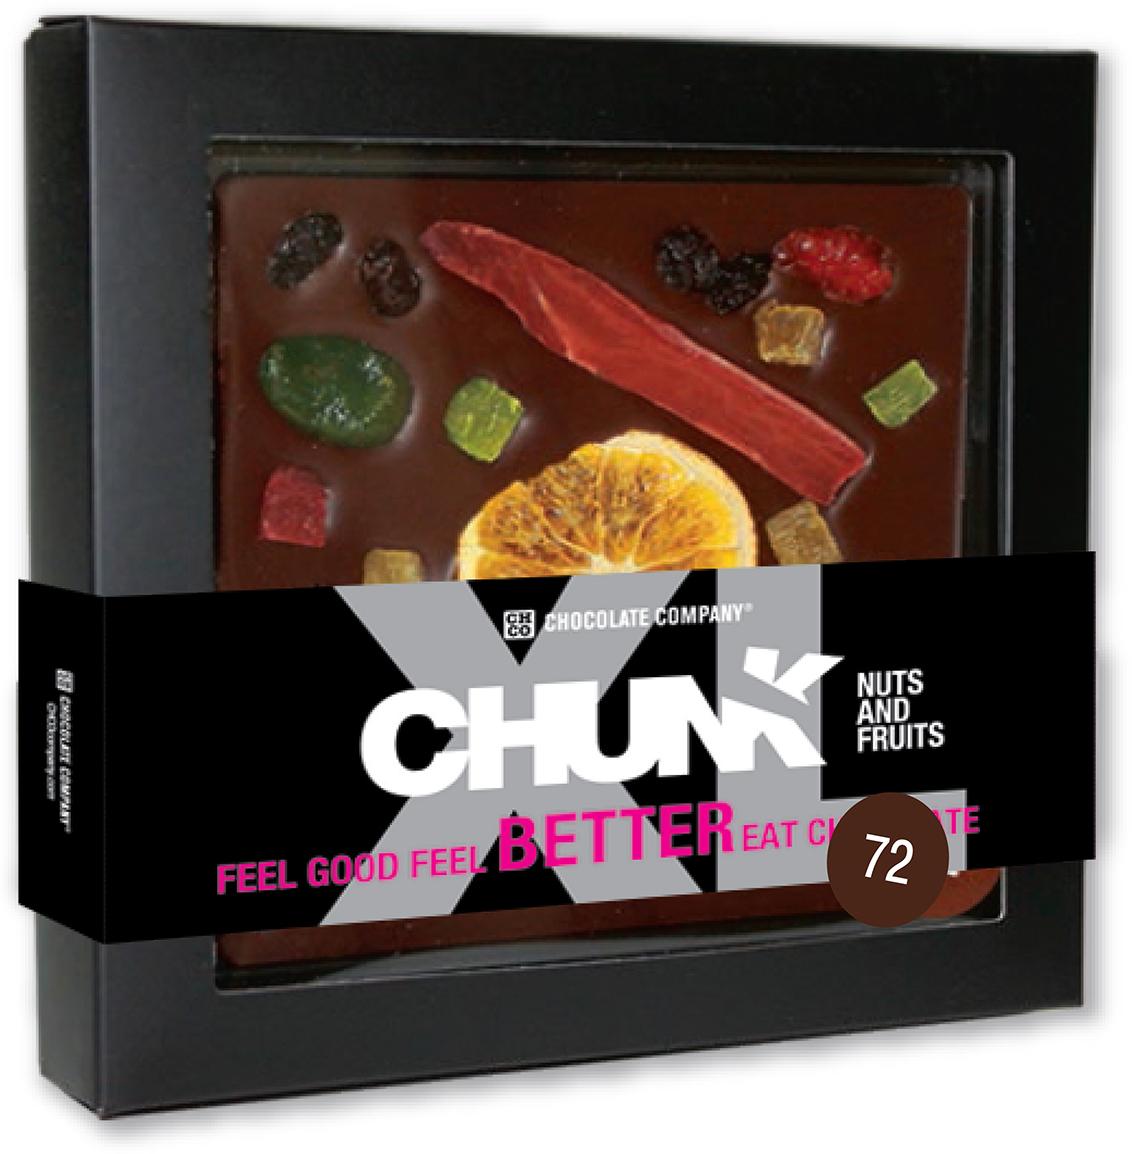 Chco Chocbar XL De Luxe Dark 72% фрукты темный шоколад, 300 г luehders мармелад экзотические фрукты 80 г